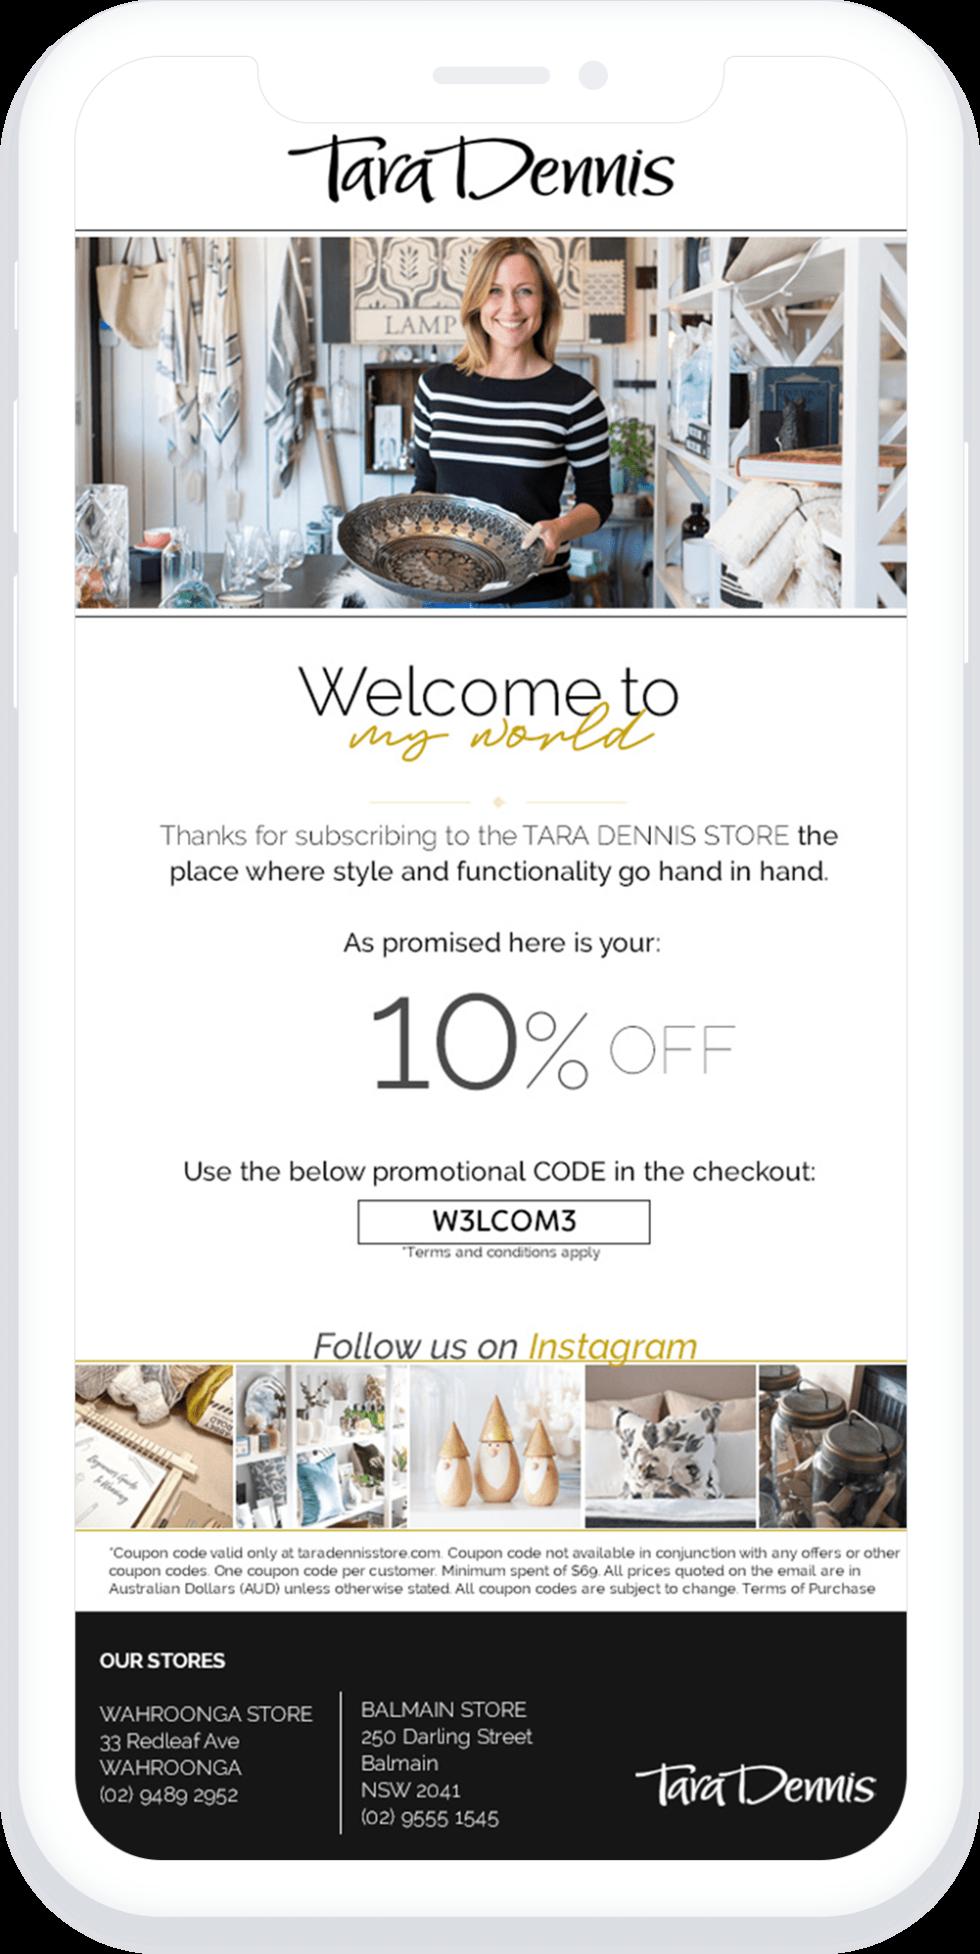 Image of Tara Dennis 10% off coupon code